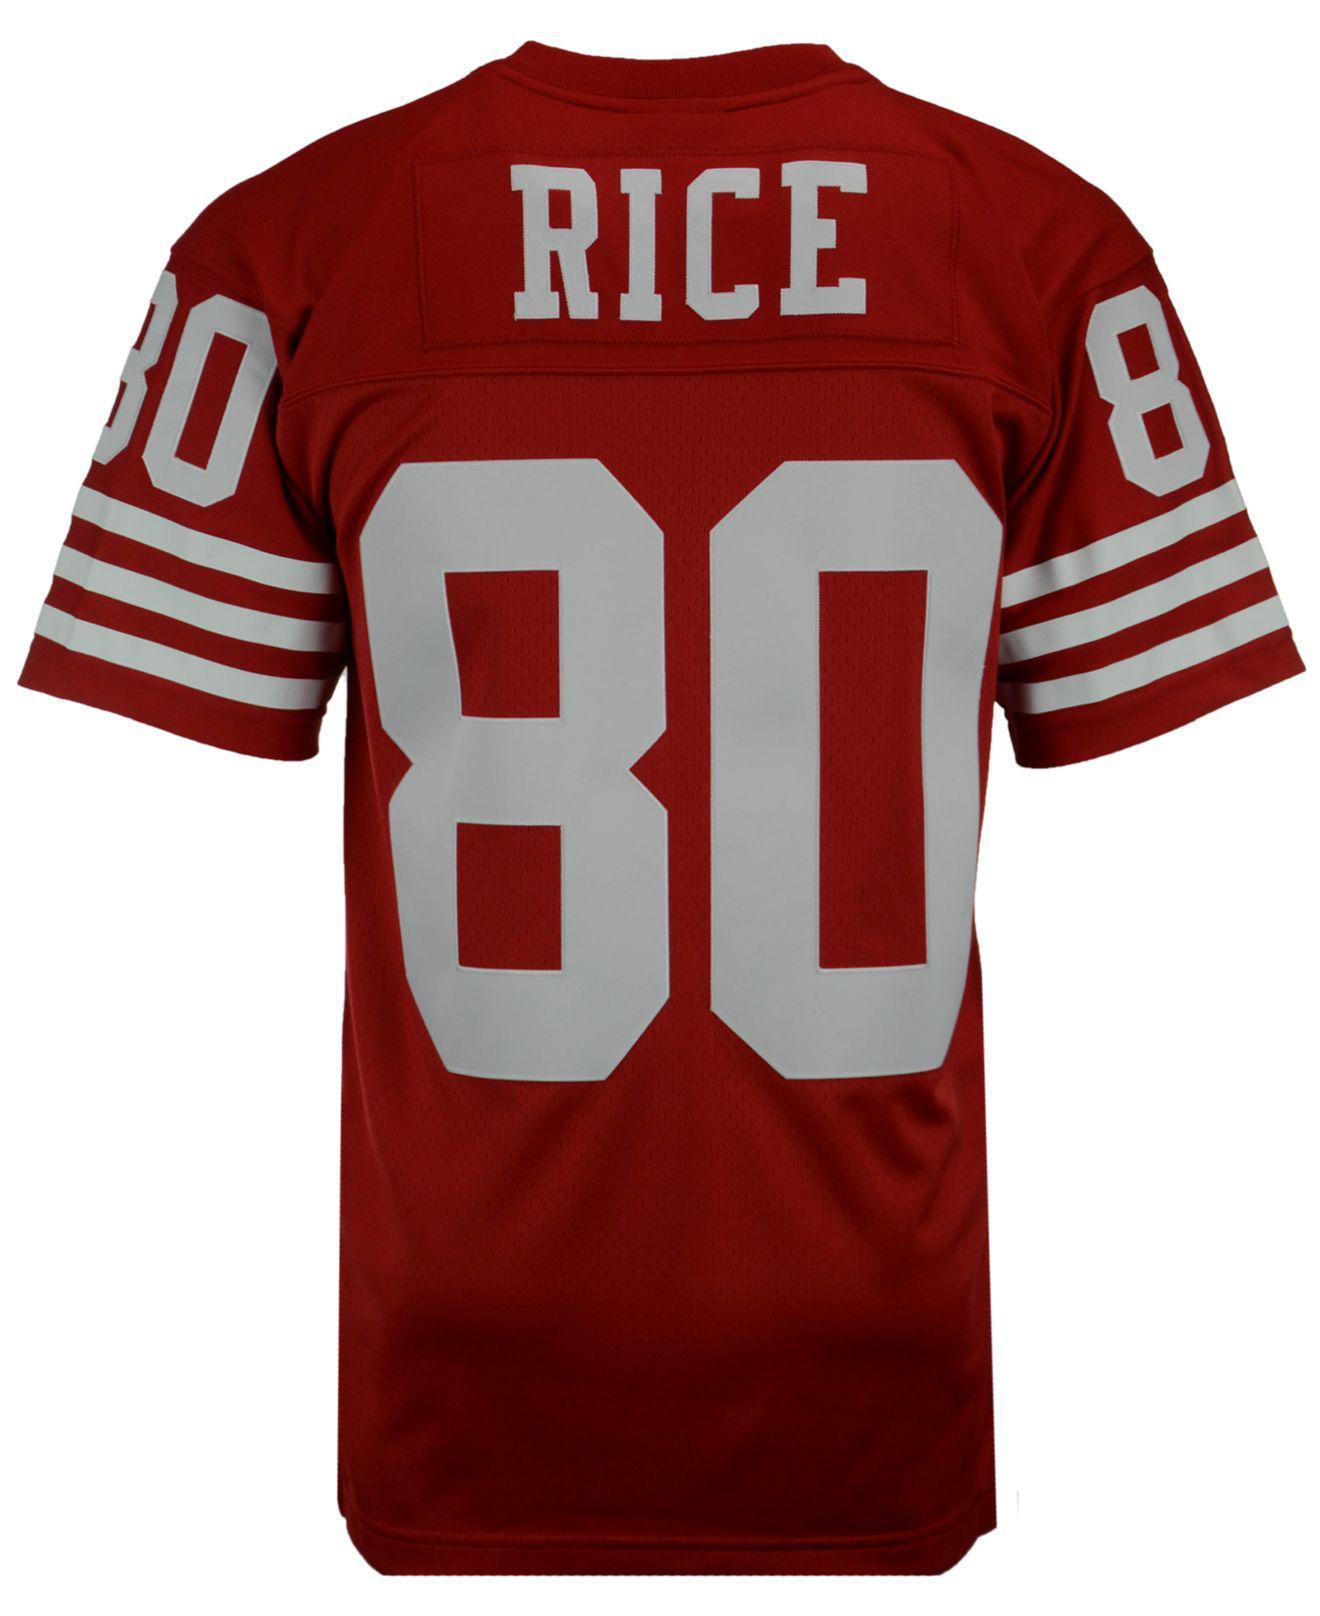 2dd7b8a5e Lyst - Mitchell   Ness Men s Jerry Rice San Francisco 49ers Replica ...